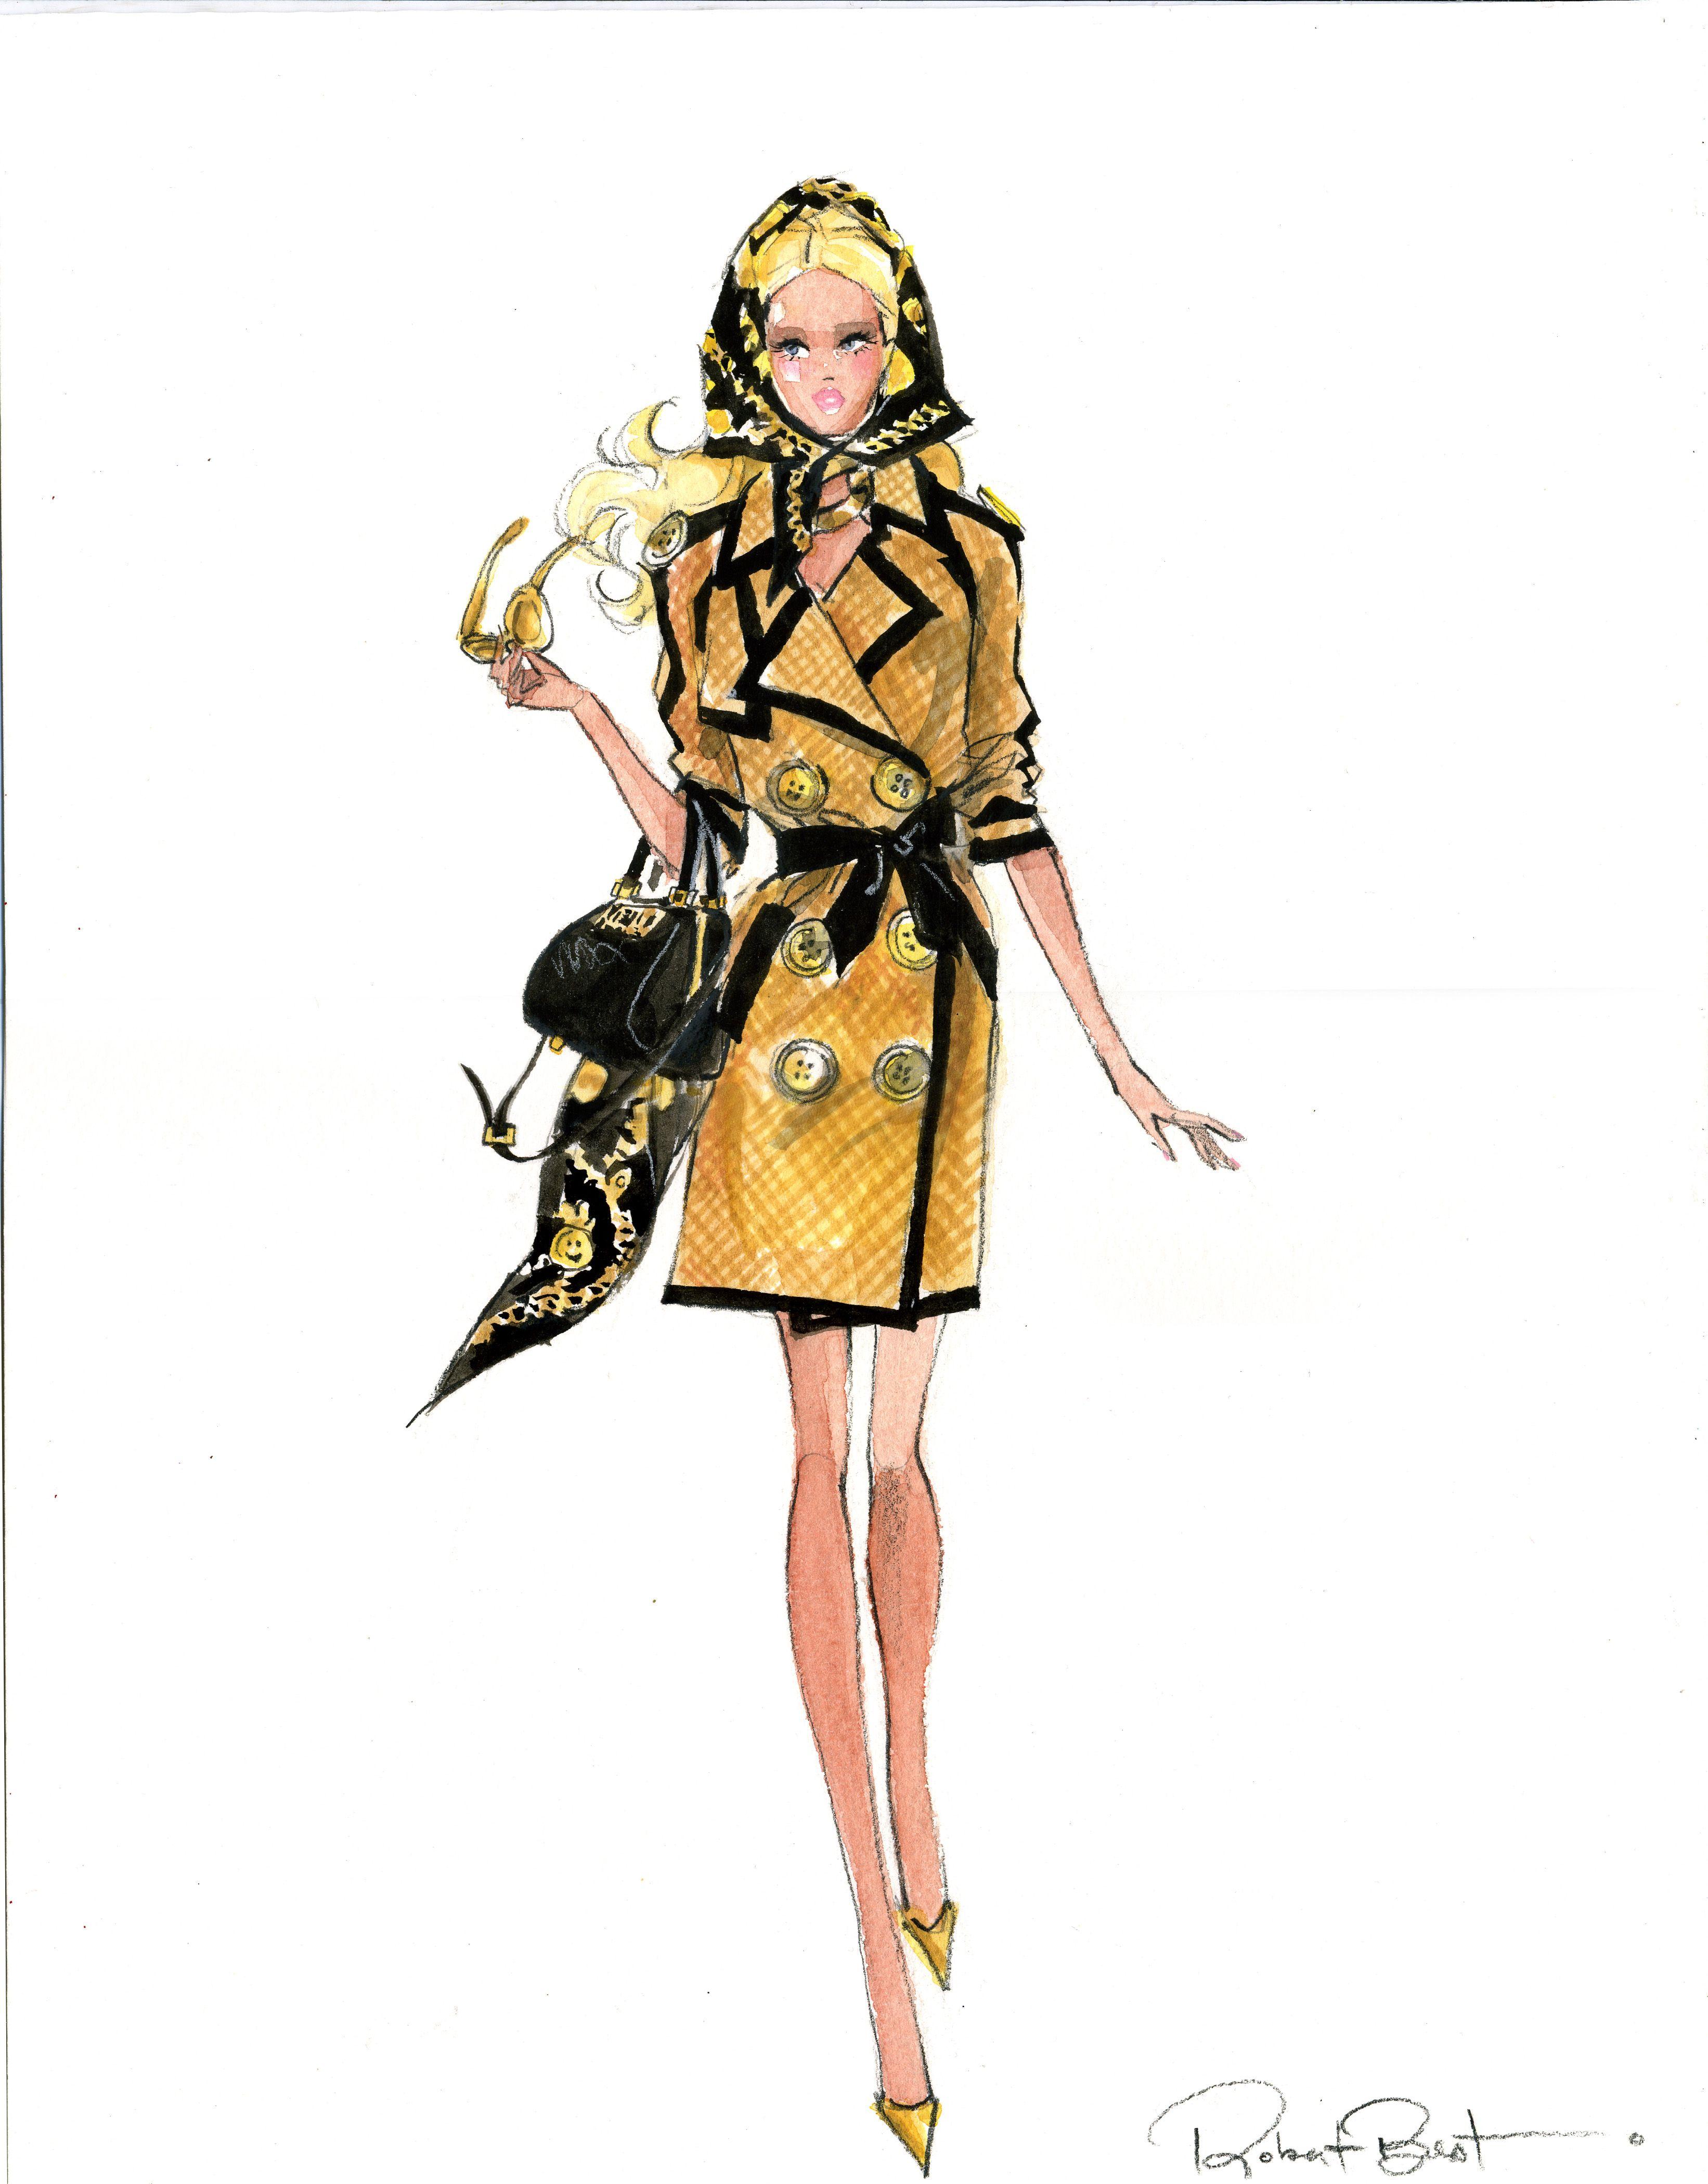 Moschino Barbie Illustration By Robert Best Barbie En 2019